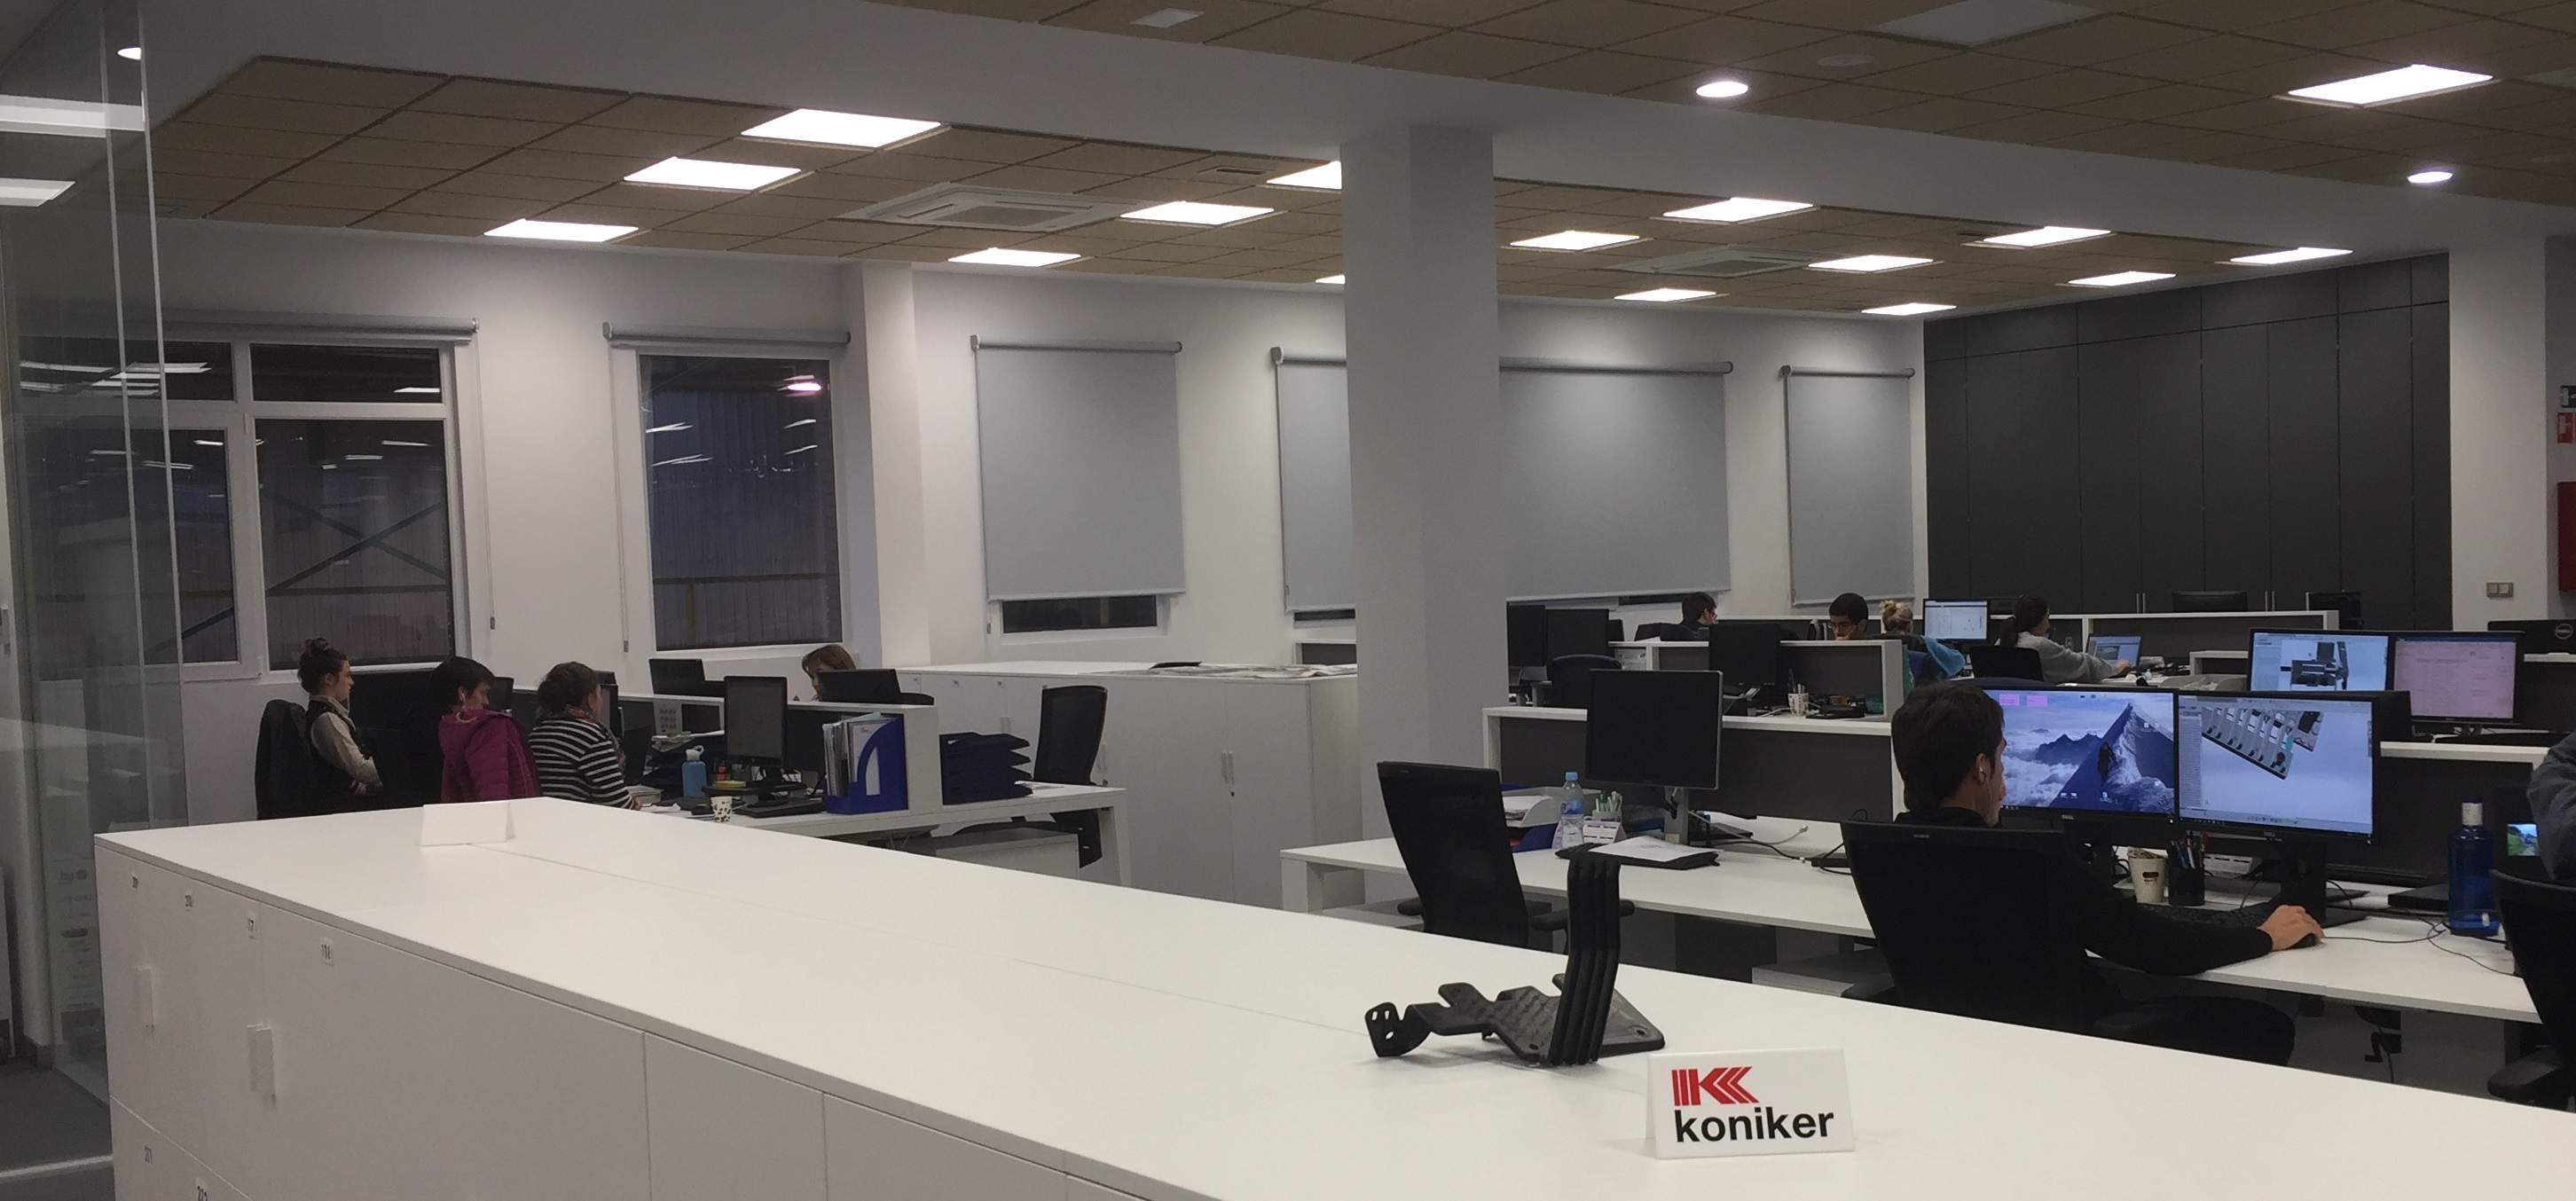 KONIKER facilities located in Arrasate (Gipuzkoa).